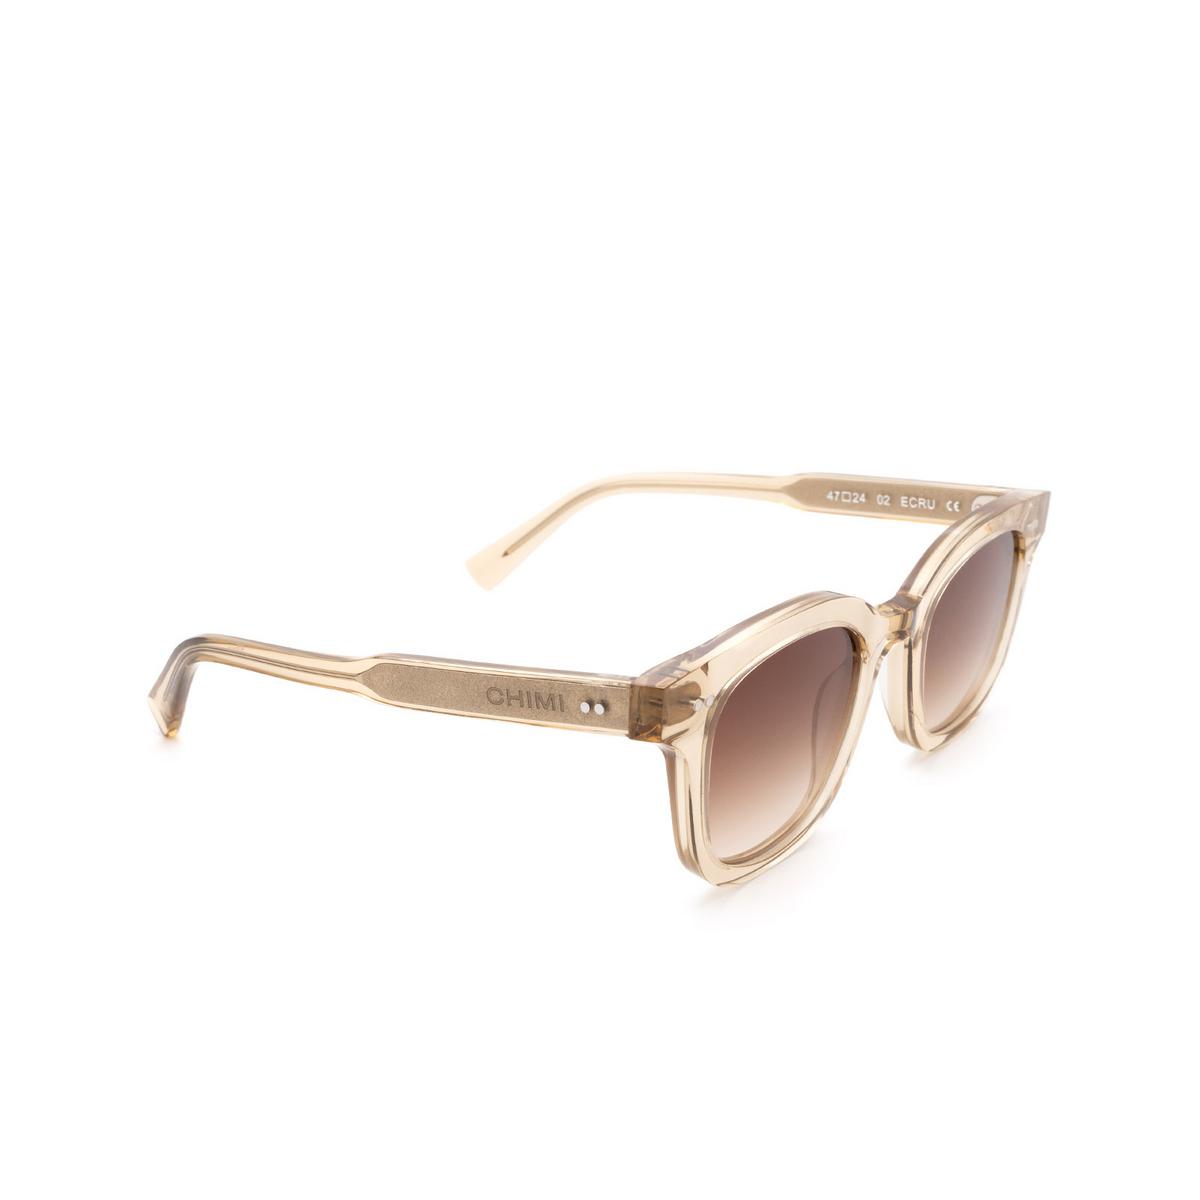 Chimi® Square Sunglasses: 02 color Ecru - three-quarters view.